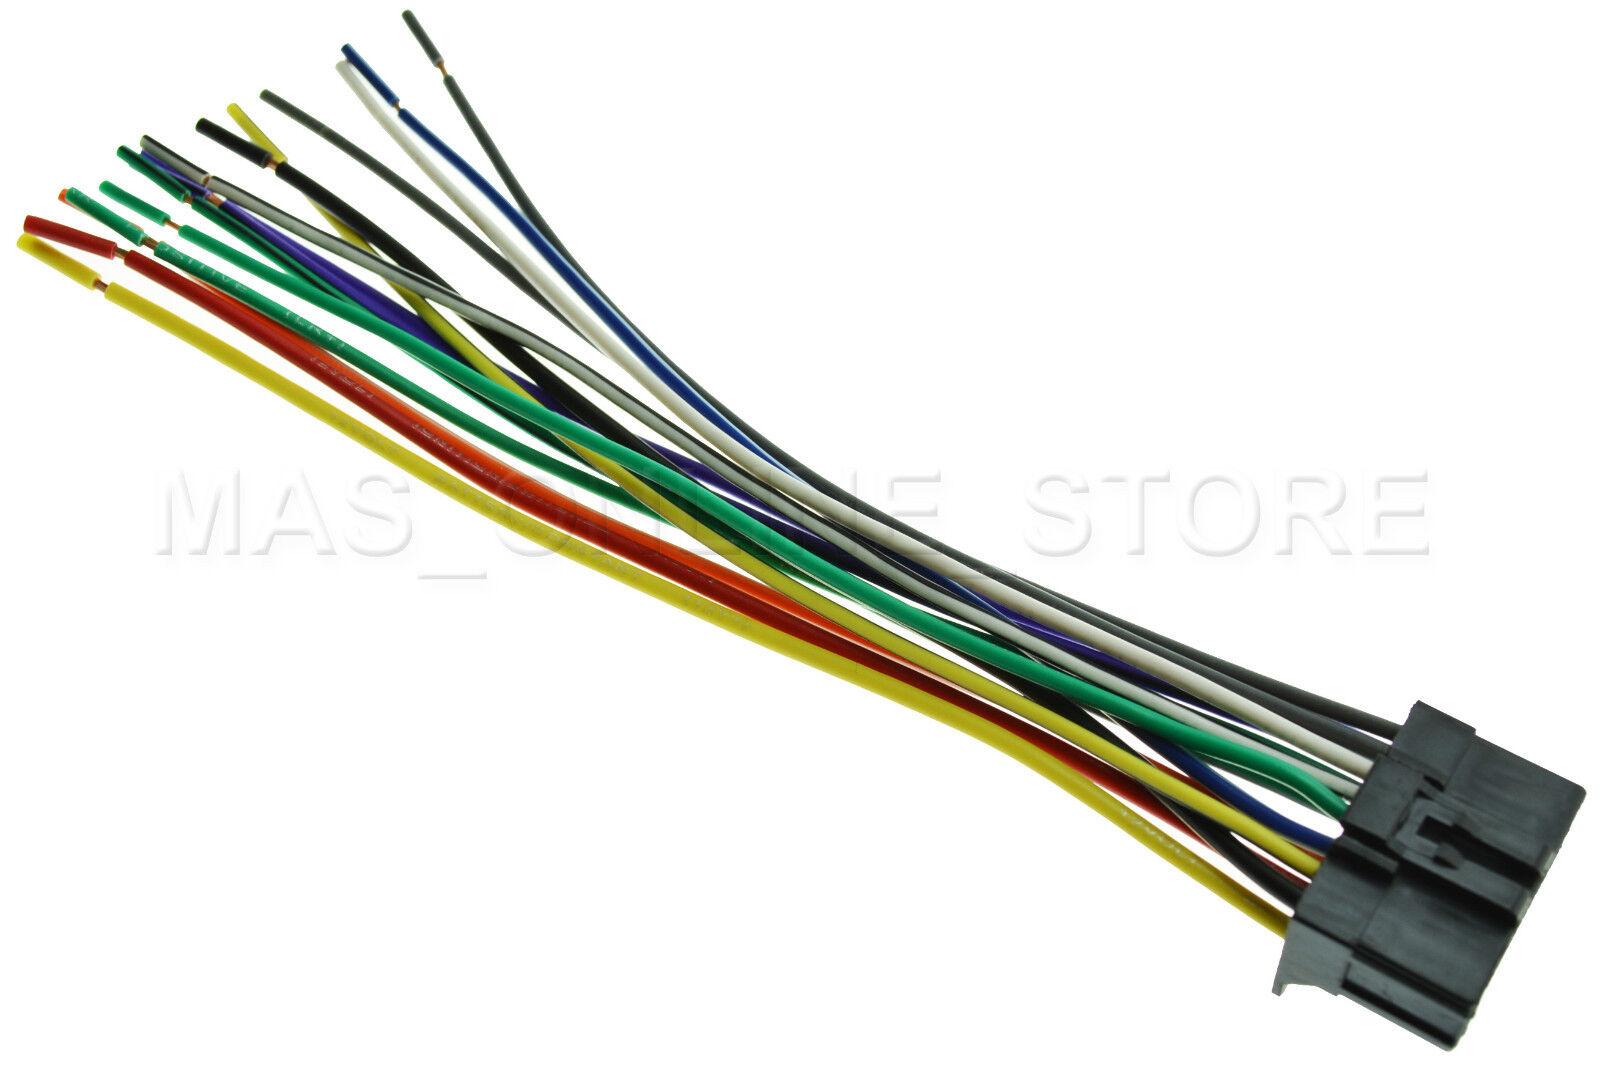 hight resolution of pioneer avh p2300dvd avhp2300dvd wire wiring harness for sale online ebay